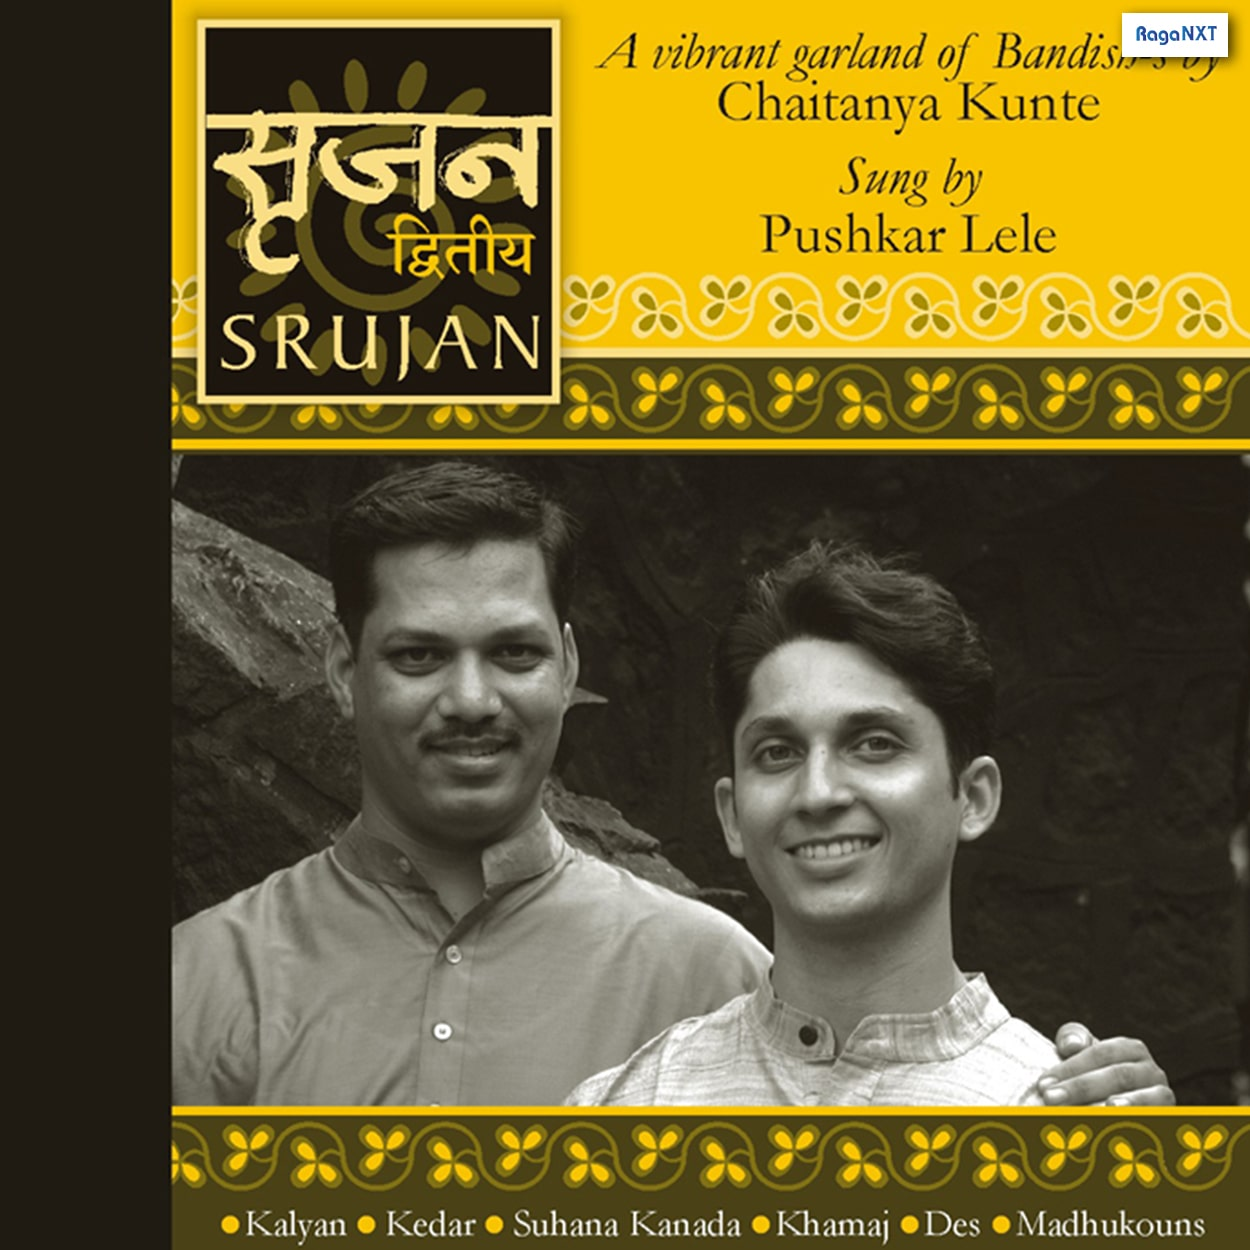 Chhayanat by Ustad Asad Ali Khan on Amazon Music - Amazon.com